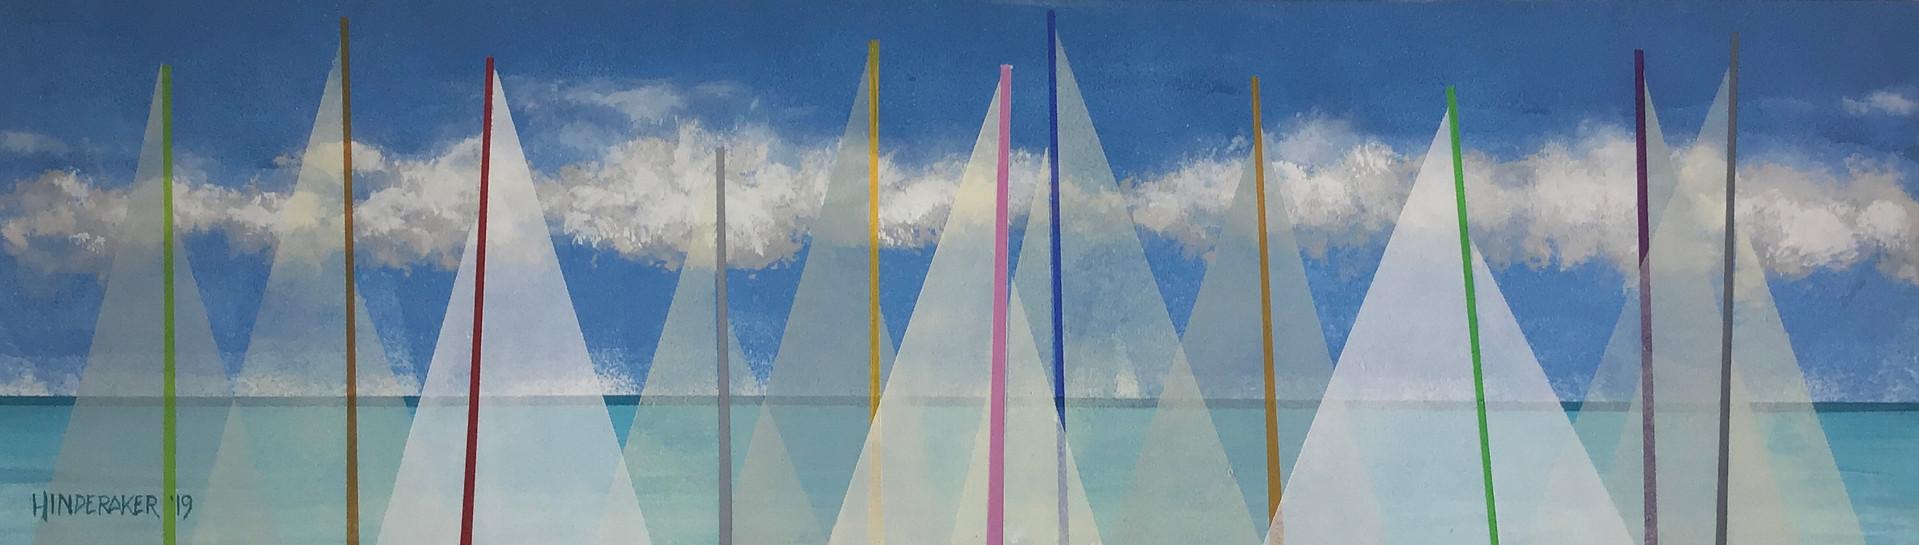 Sails #195